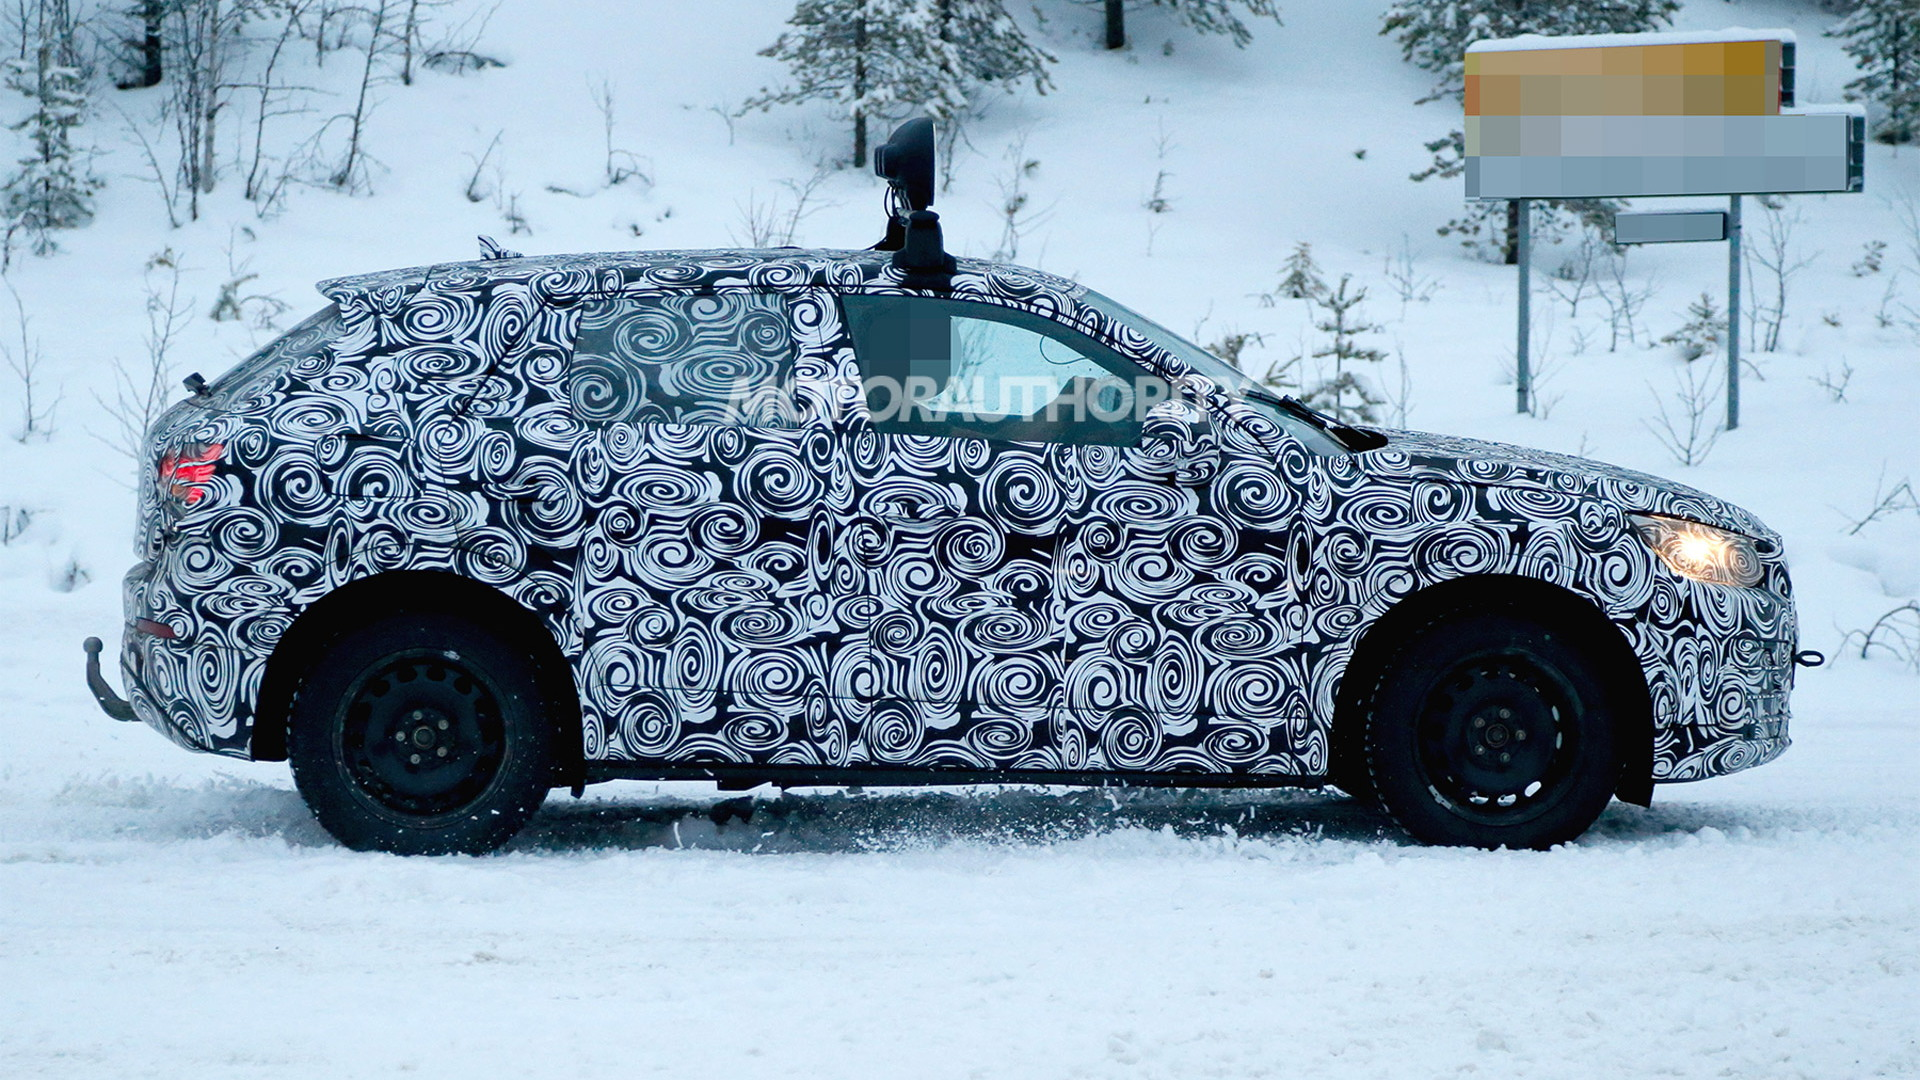 2016 Audi Q2 spy shots - Image via S. Baldauf/SB-Medien